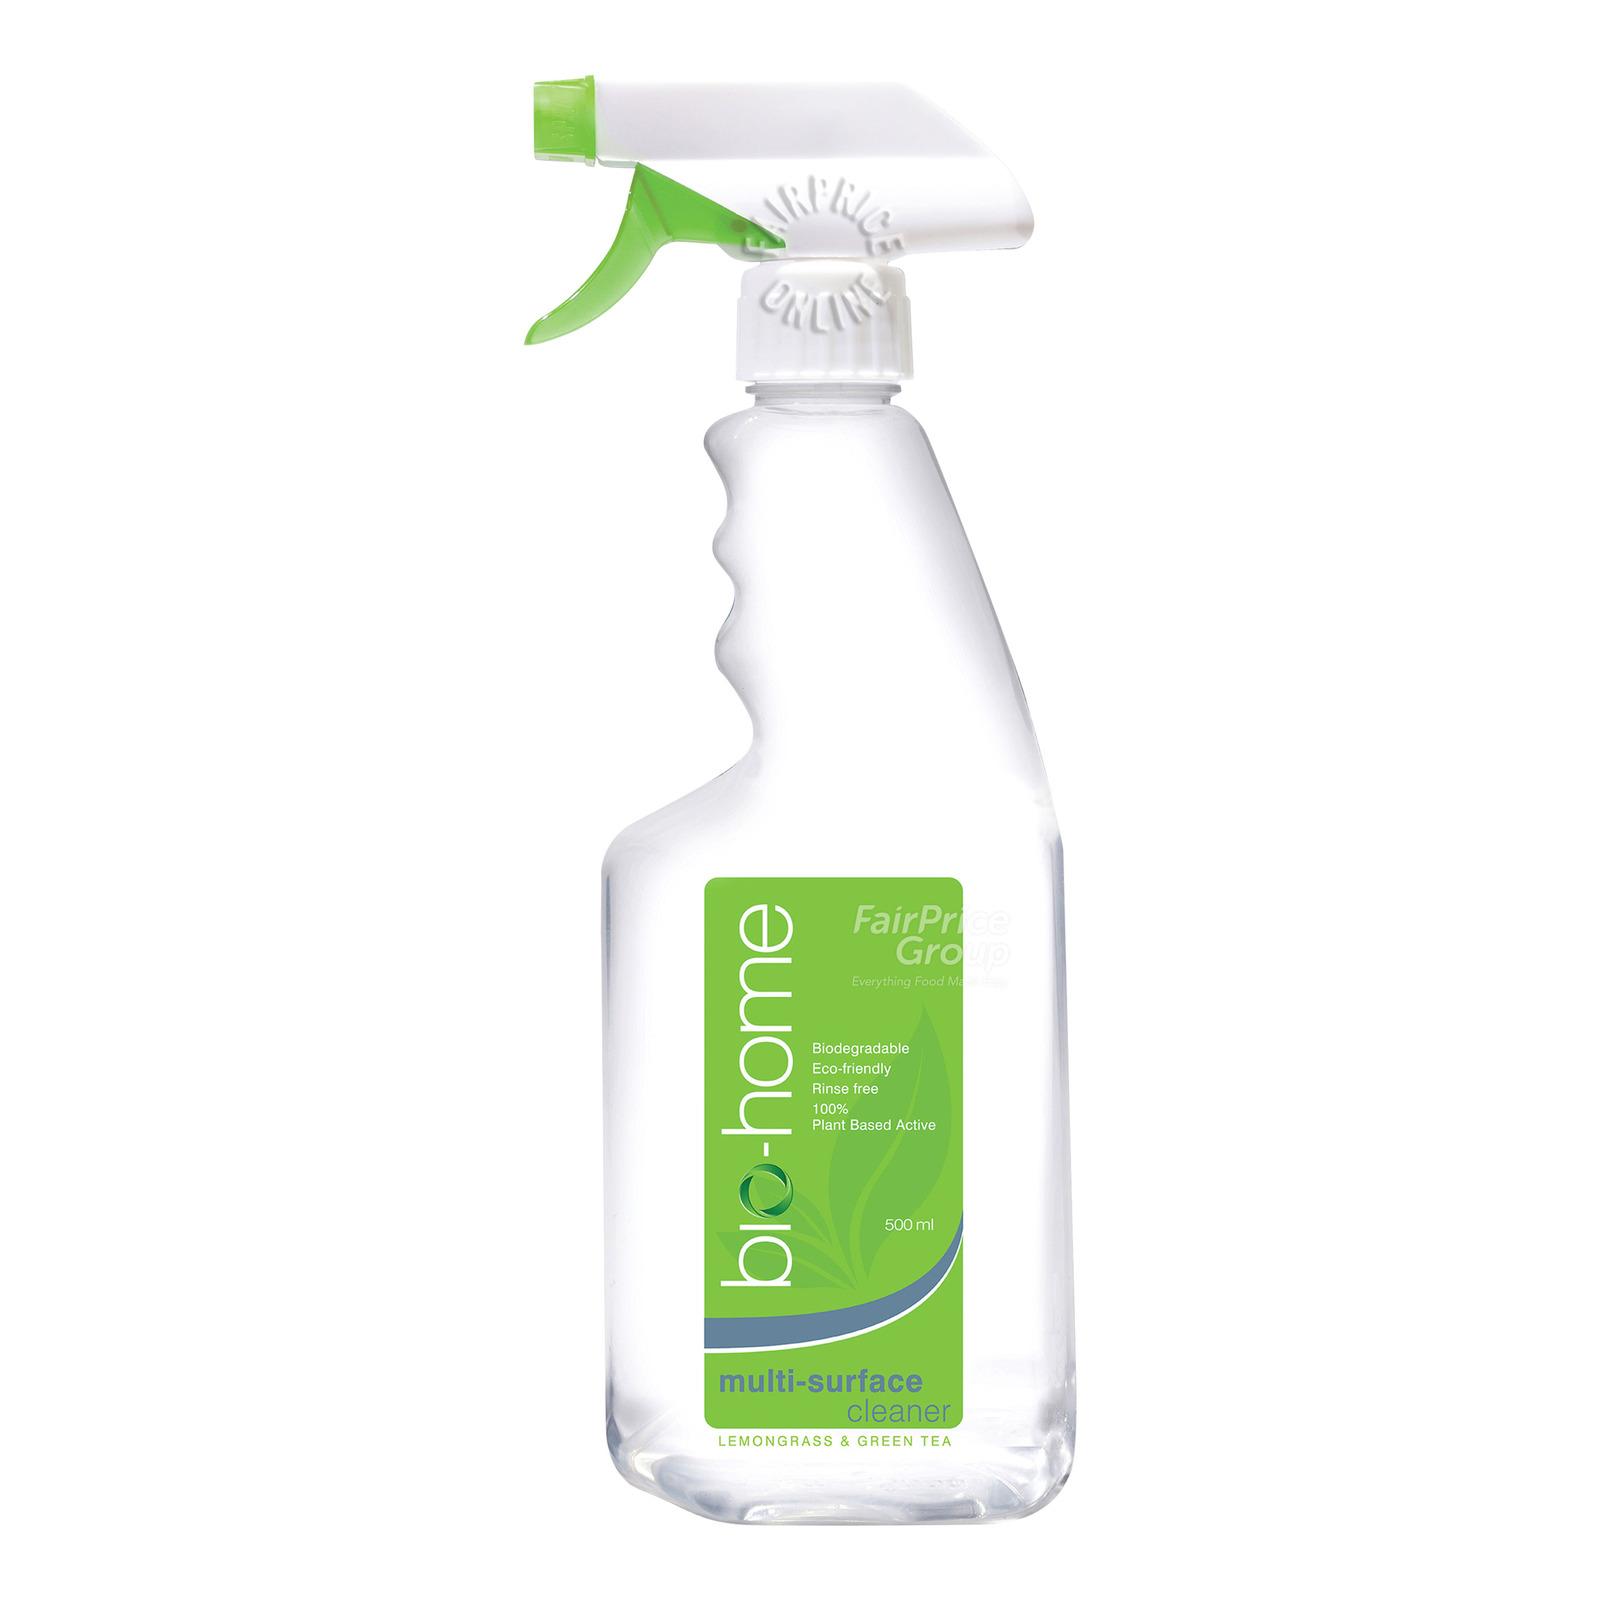 Bio-Home Multi-Surface Cleaner - Lemongrass & Green Tea